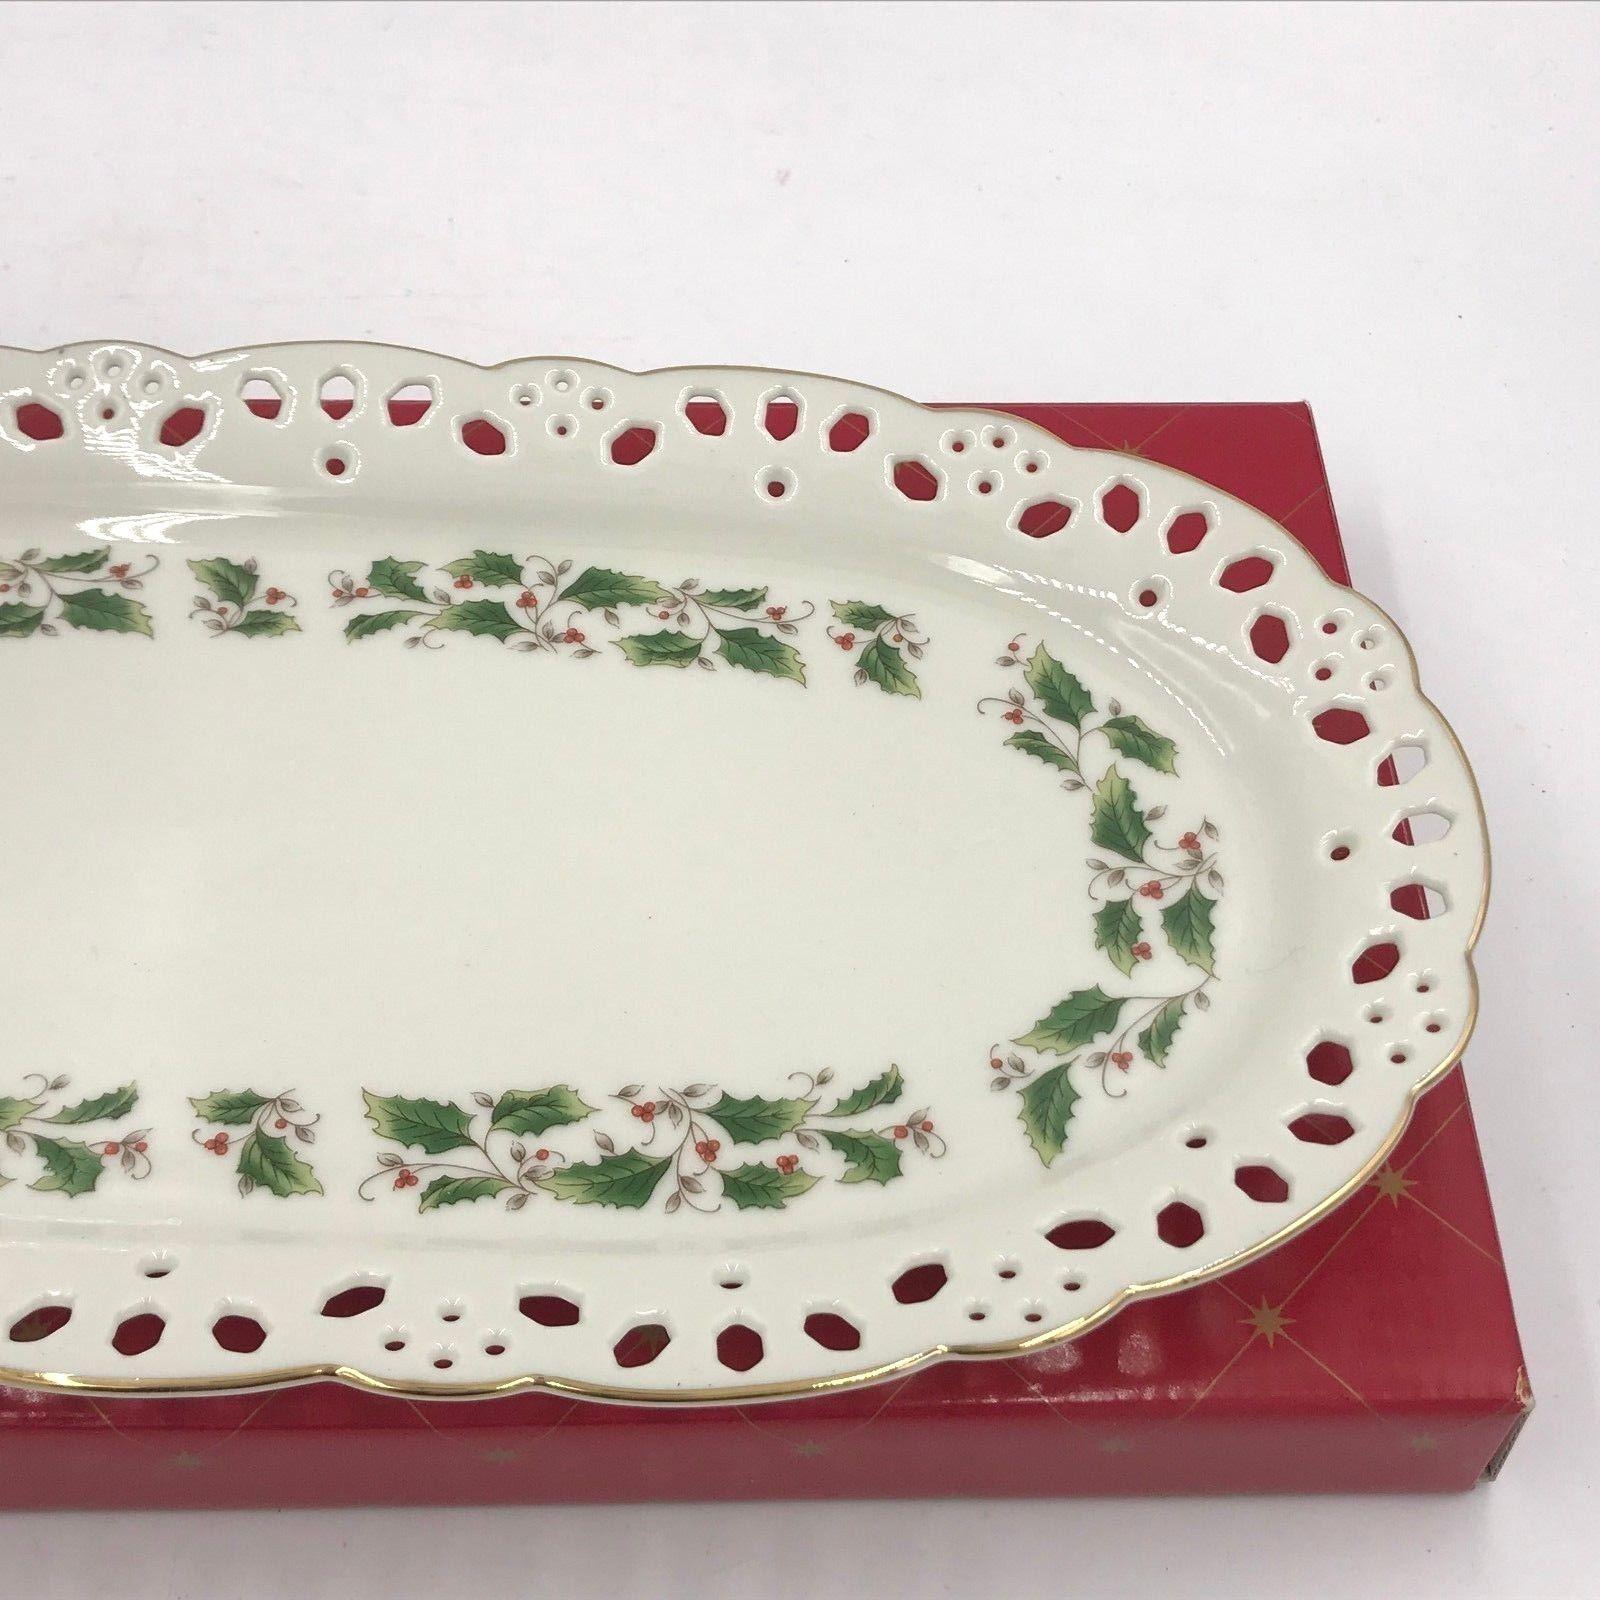 Royal Limited Holly Holiday Christmas Pierced Oval Canape Sandwich Tray NIB XM